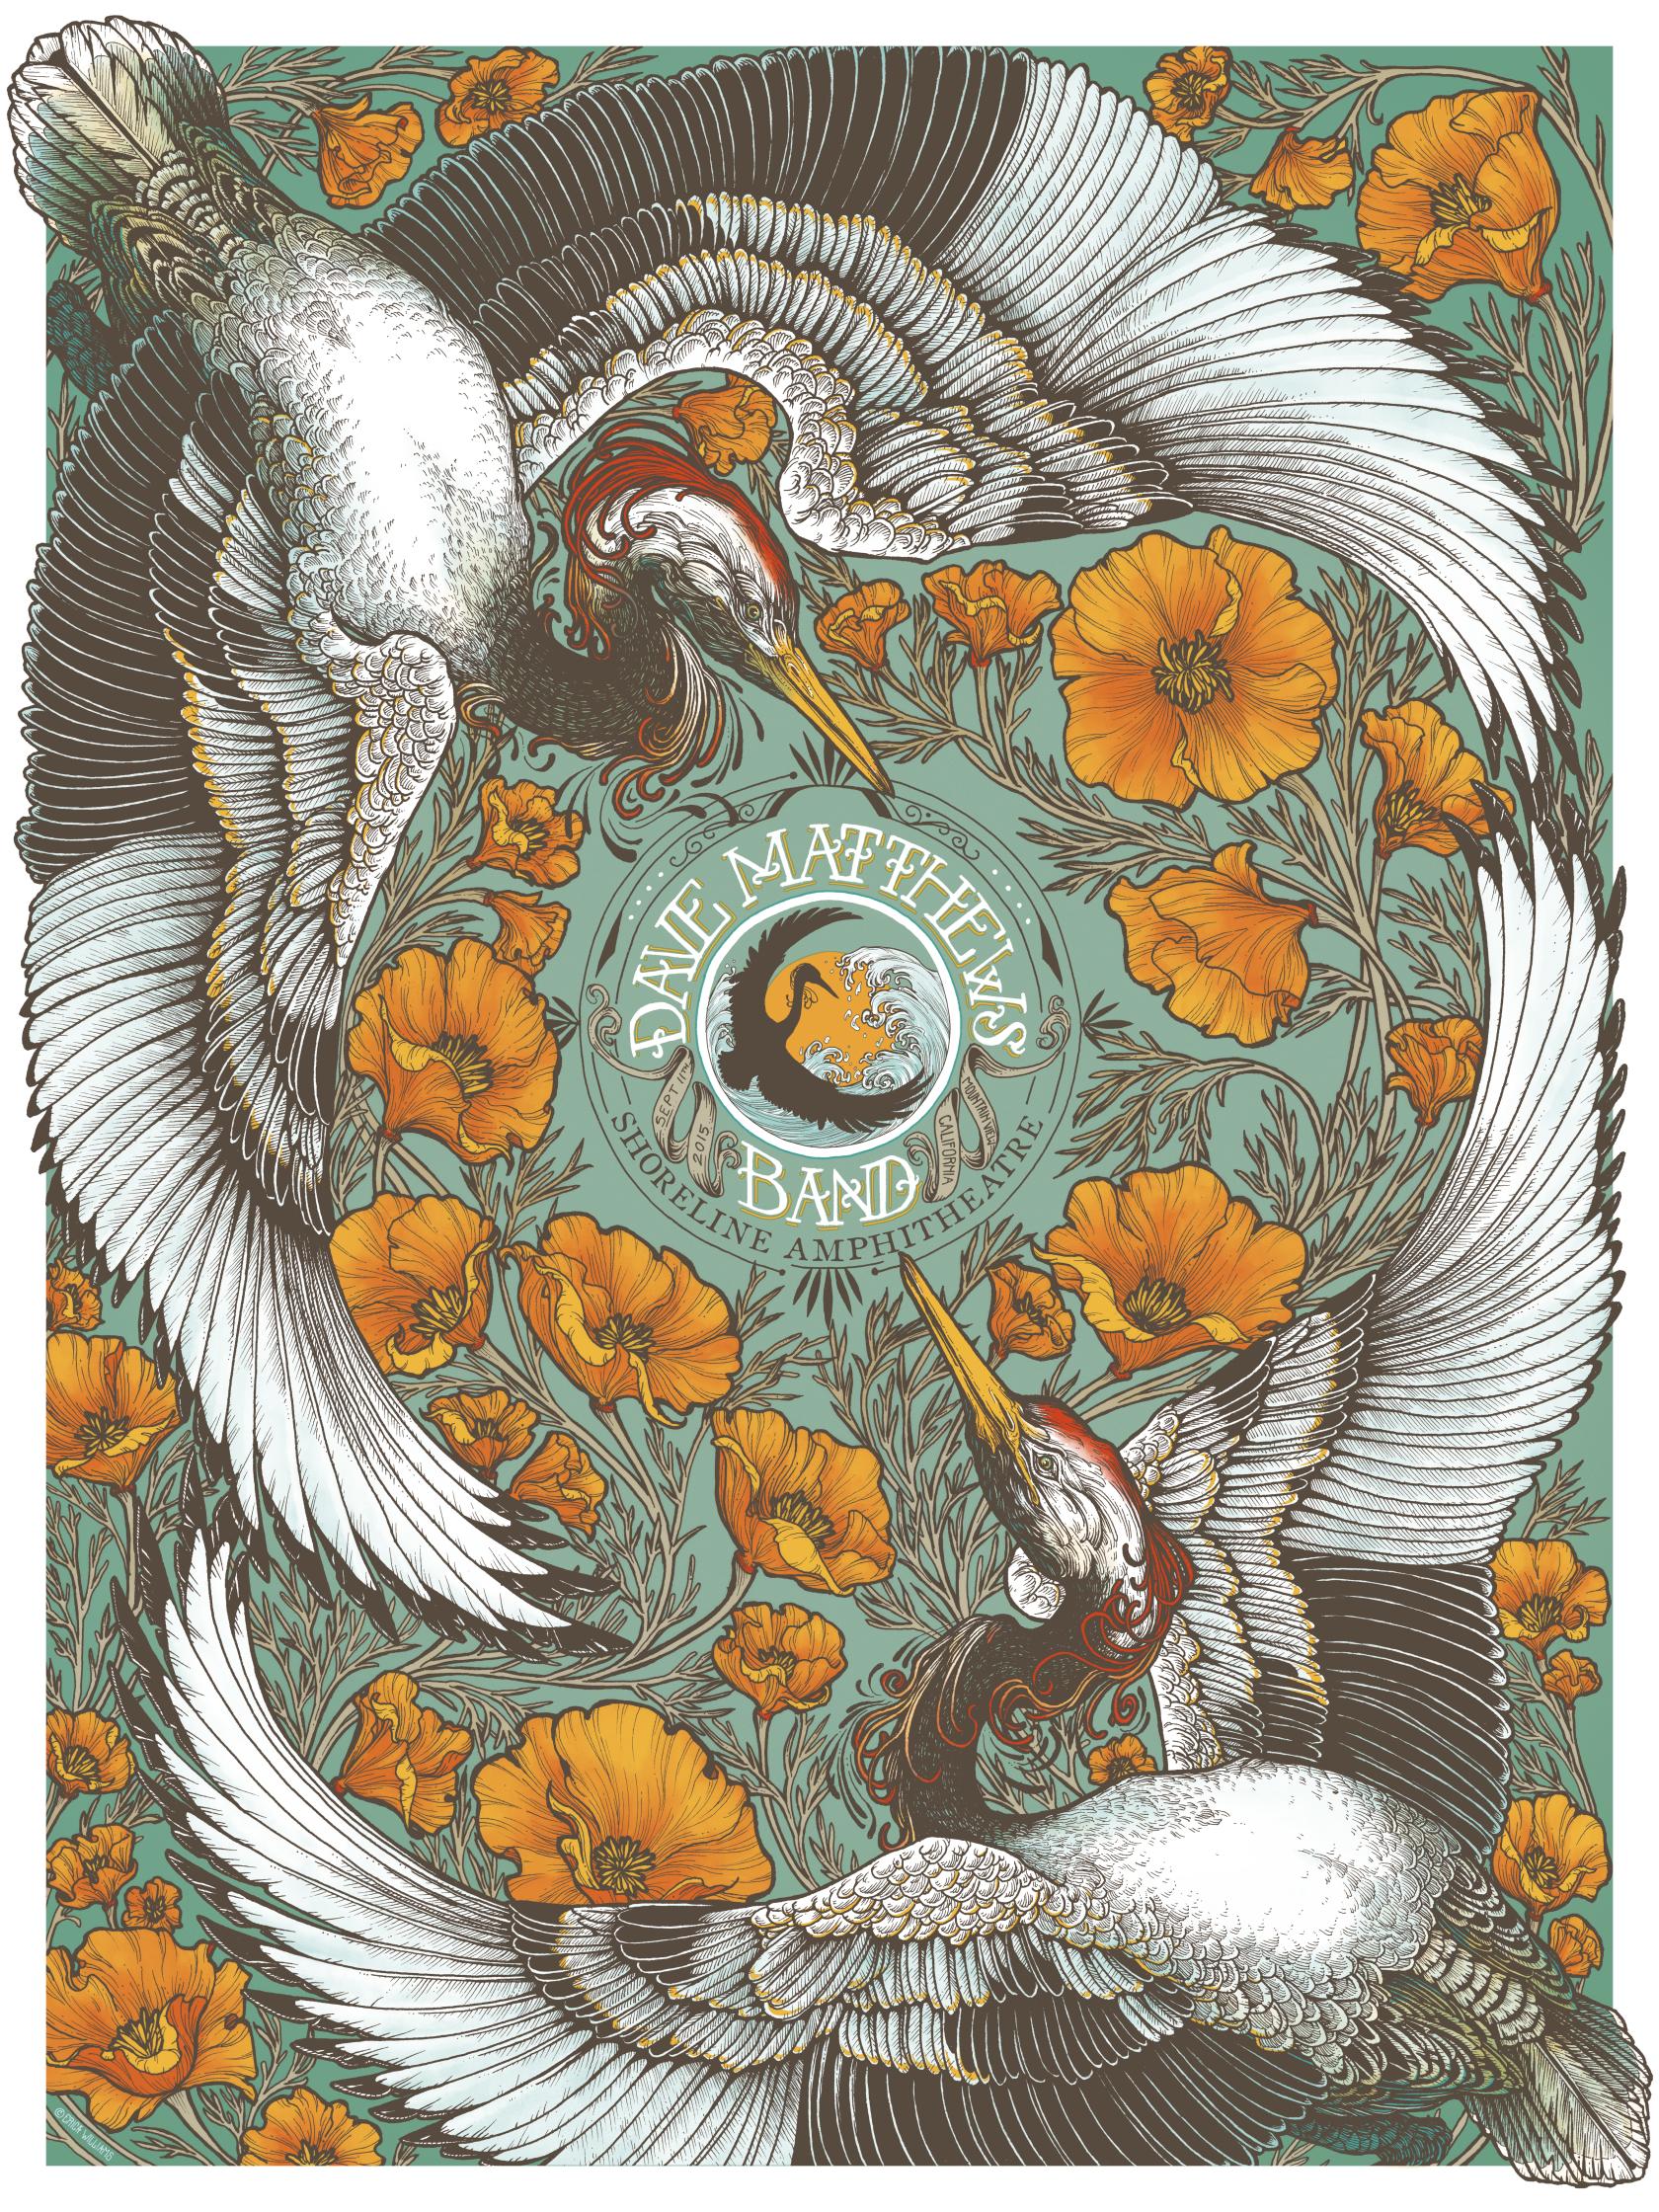 Dave Matthews Band- Shoreline Amphitheatre 2015 - Erica Williams.jpg